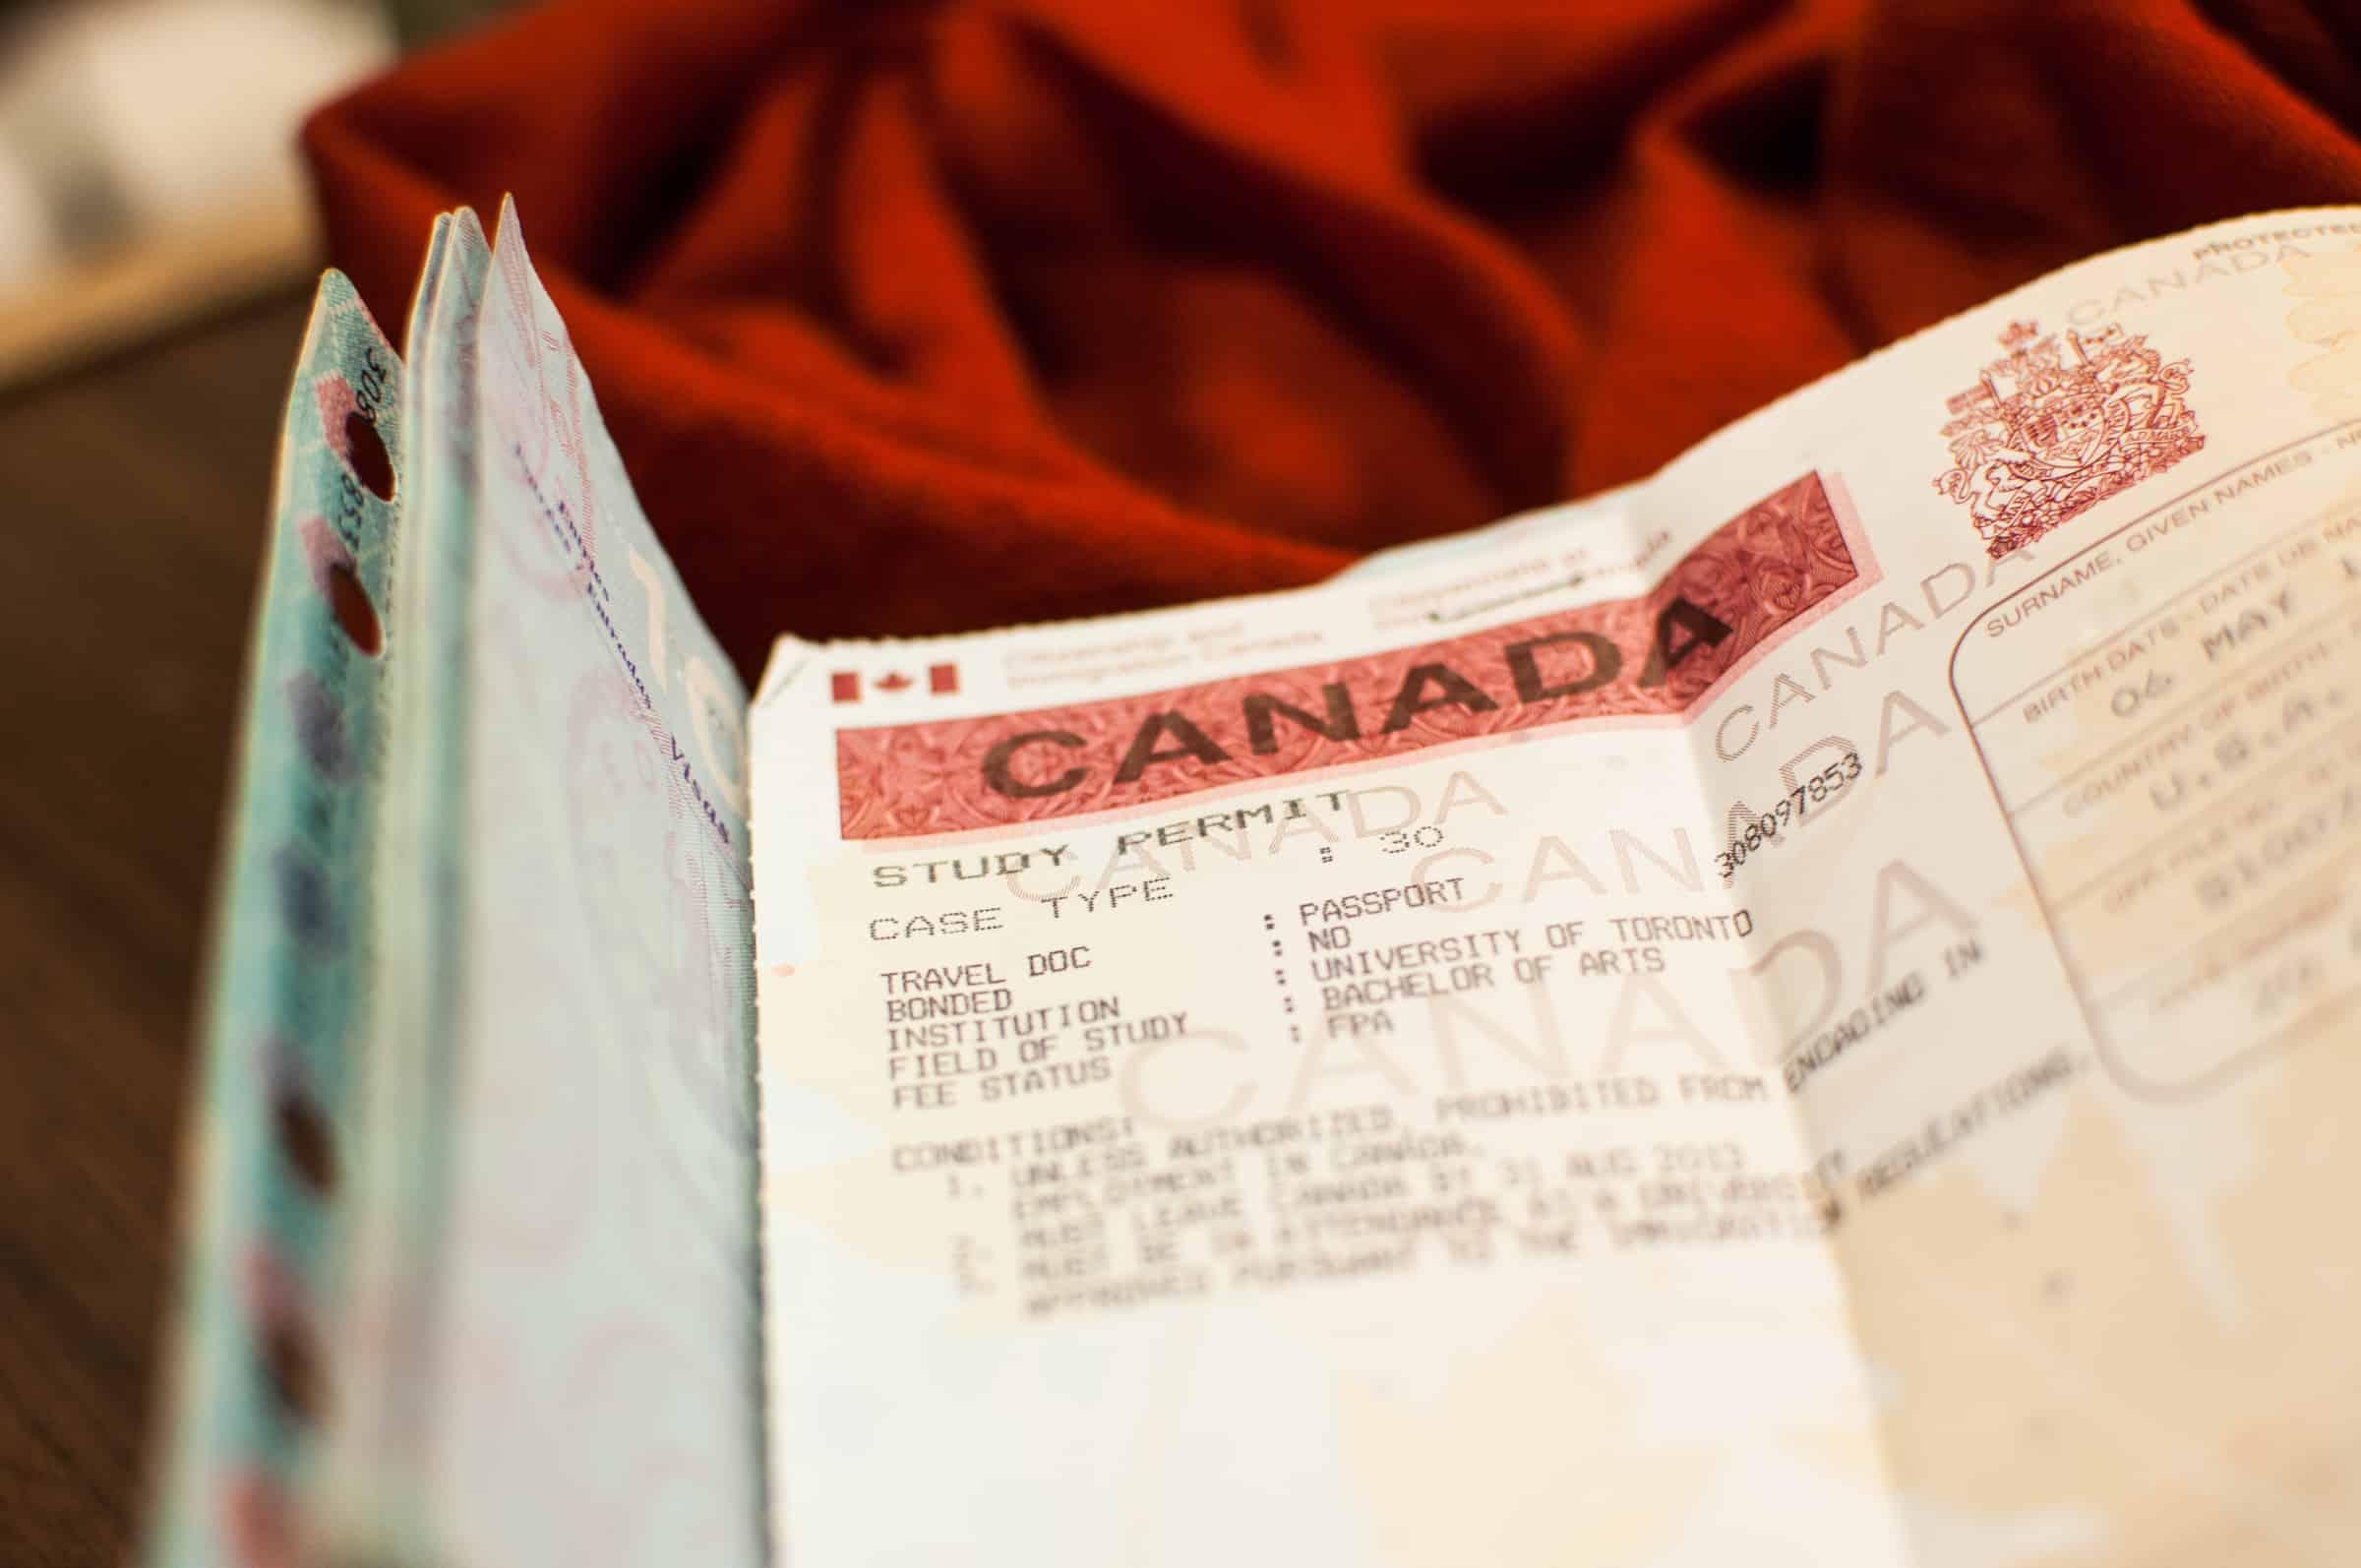 NEWS_U_of_T_International_students-FilePhoto-FILE_PHOTO_BERNARDA_GOSPICTHE_VARSITY-Canada_Canadian_visa_study_permit_paper.jpg - 89.07 kb